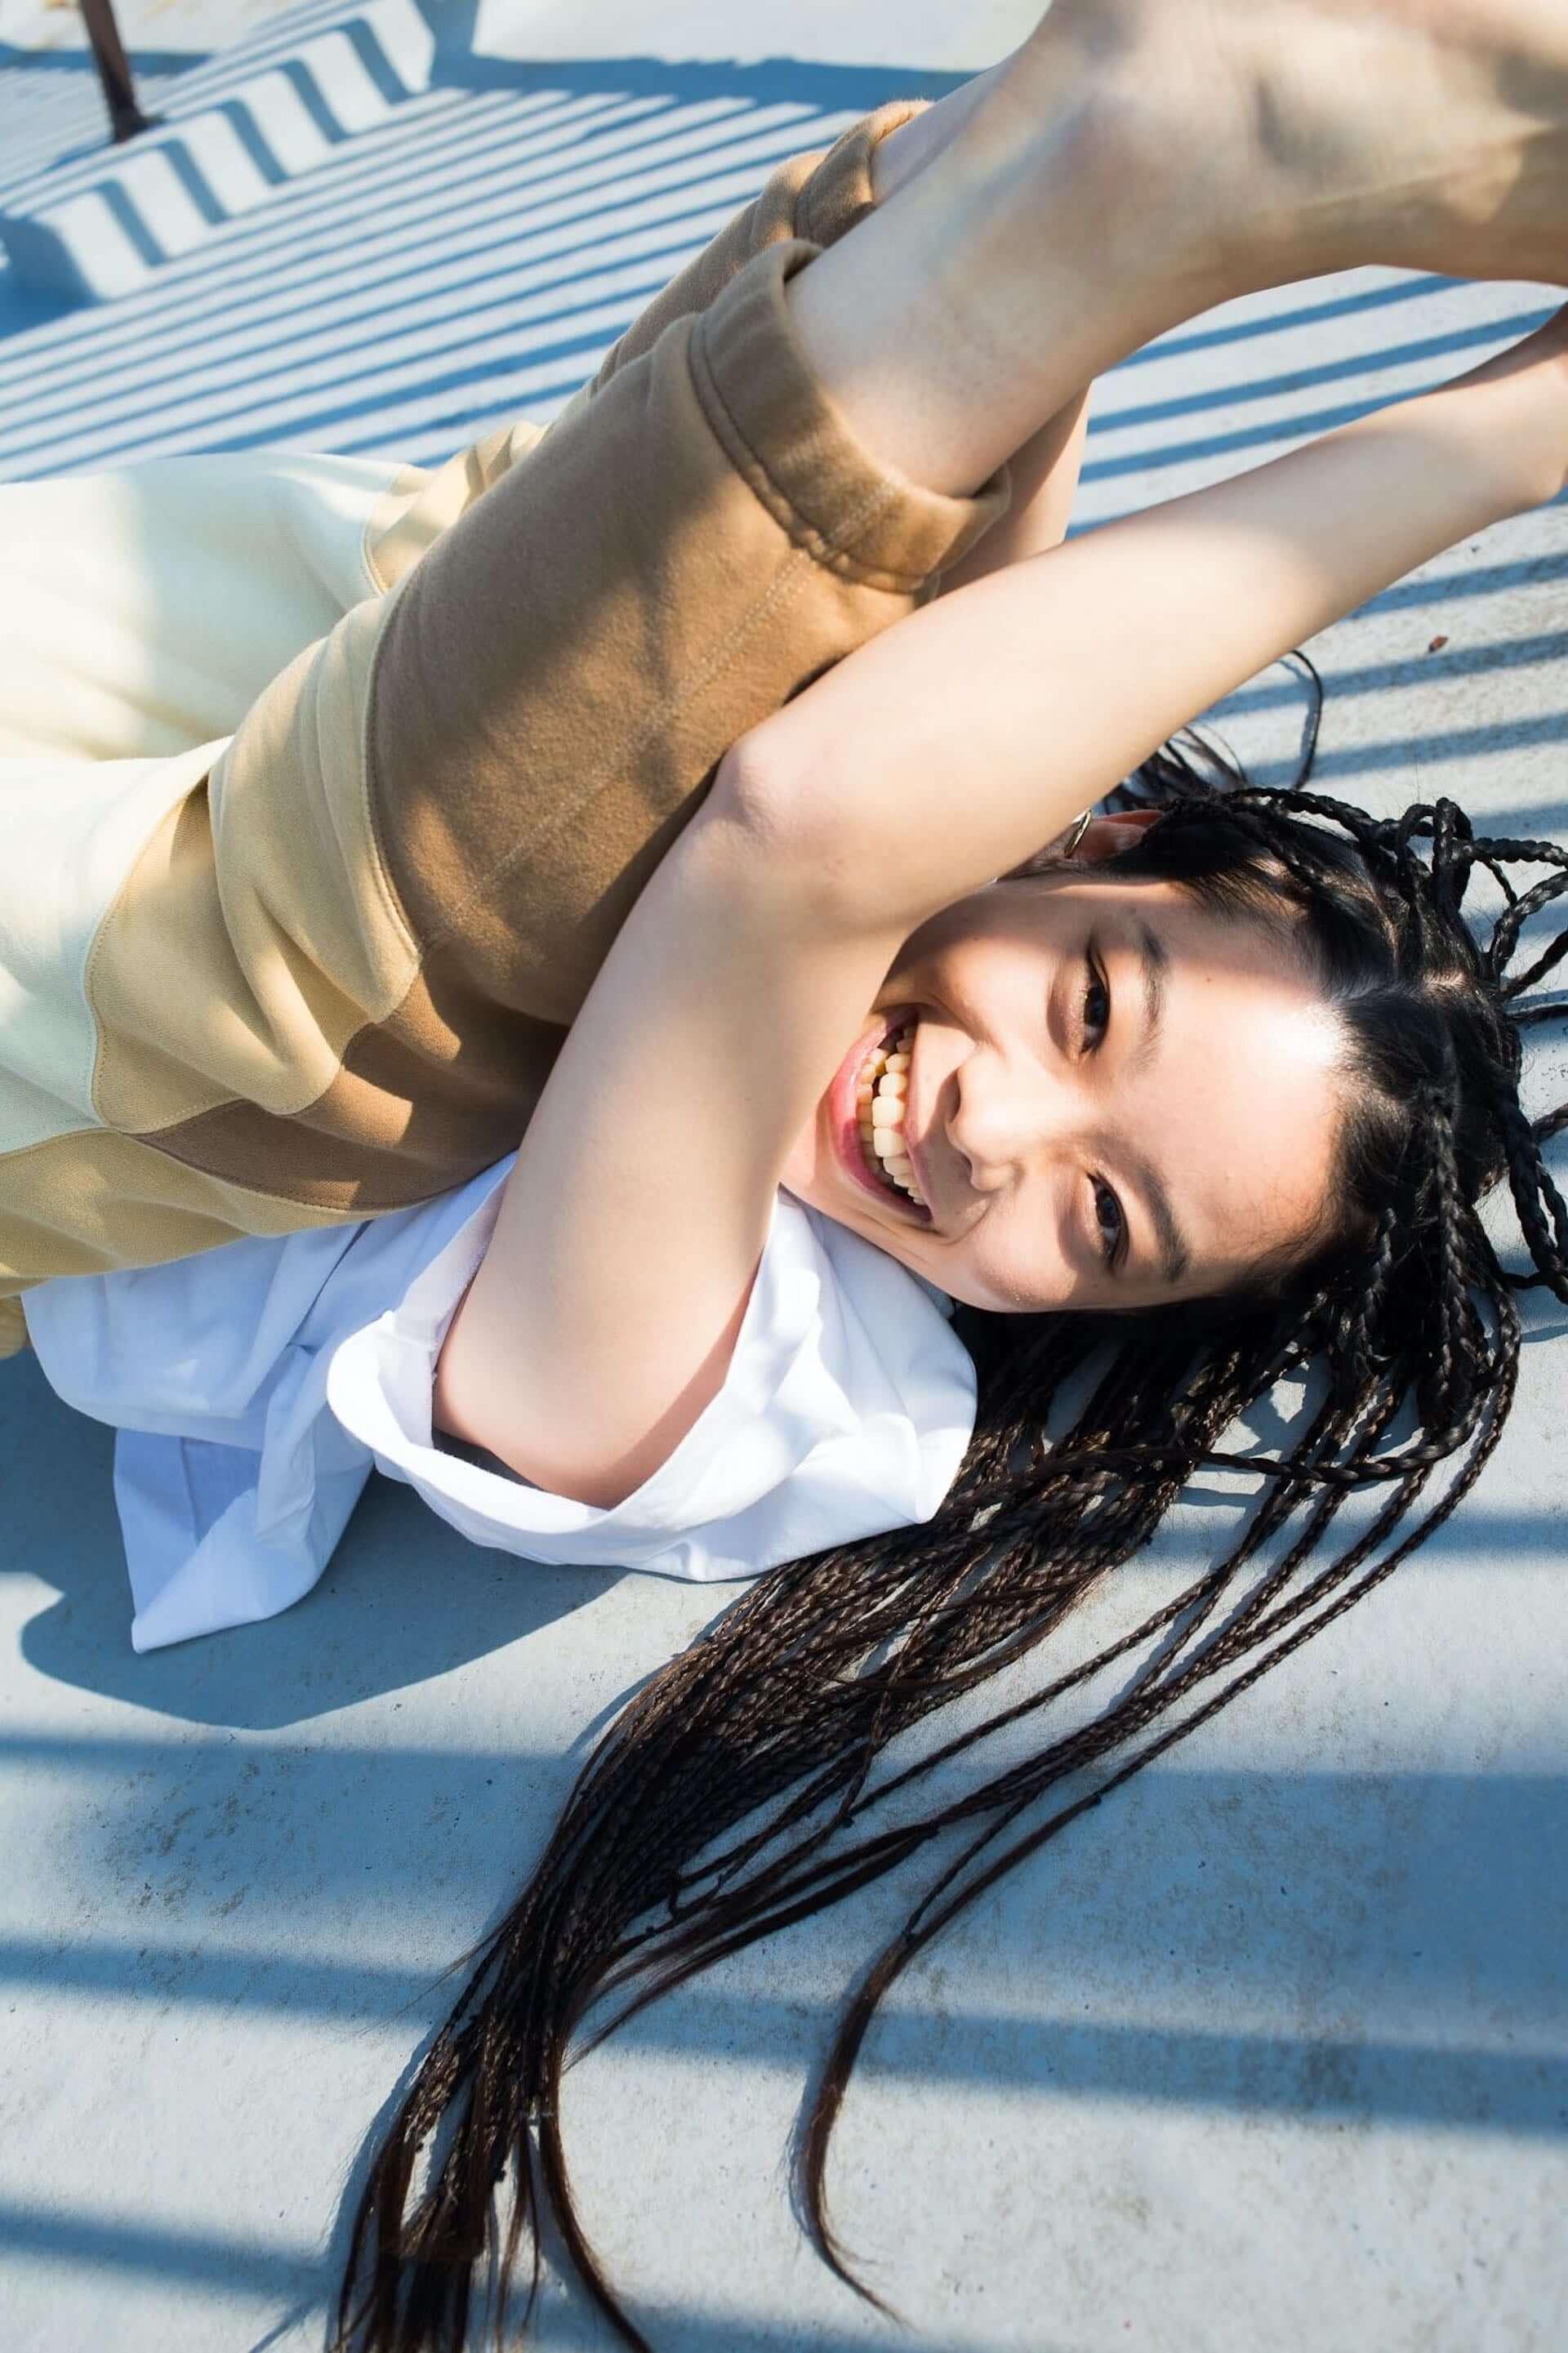 xiangyuの自主企画<香魚荘#02>にTaigen Kawabeのソロプロジェクト・Ill Japoniaが出演決定!公開ミーティングは今夜開催 music200819_xiangyu_1-1920x2881